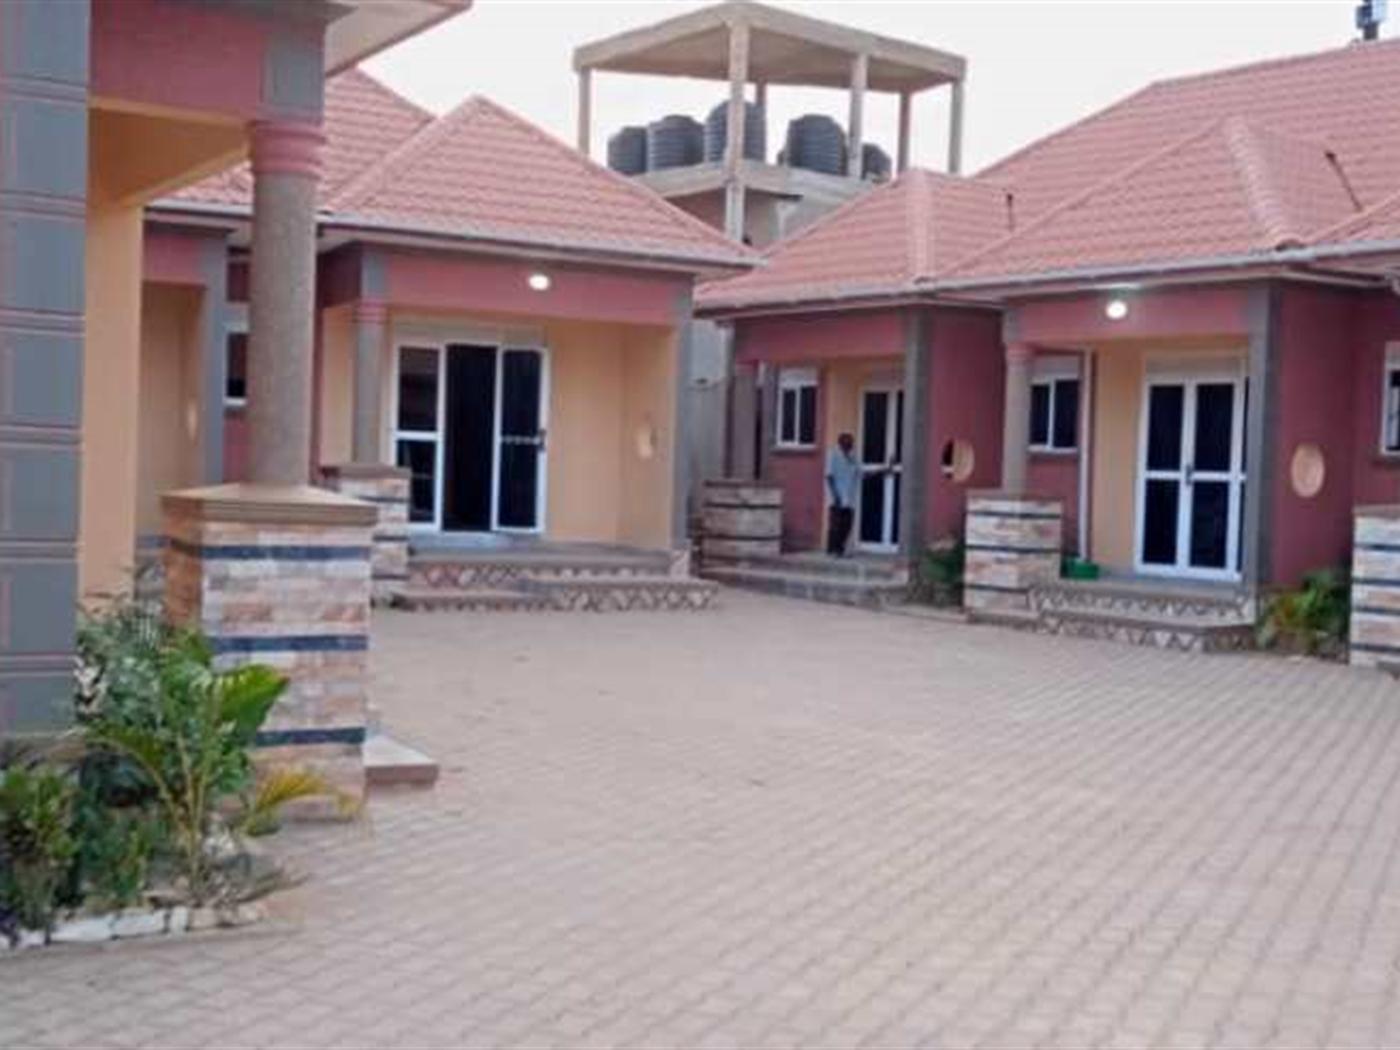 Rental units for sale in Kisaasi Kampala